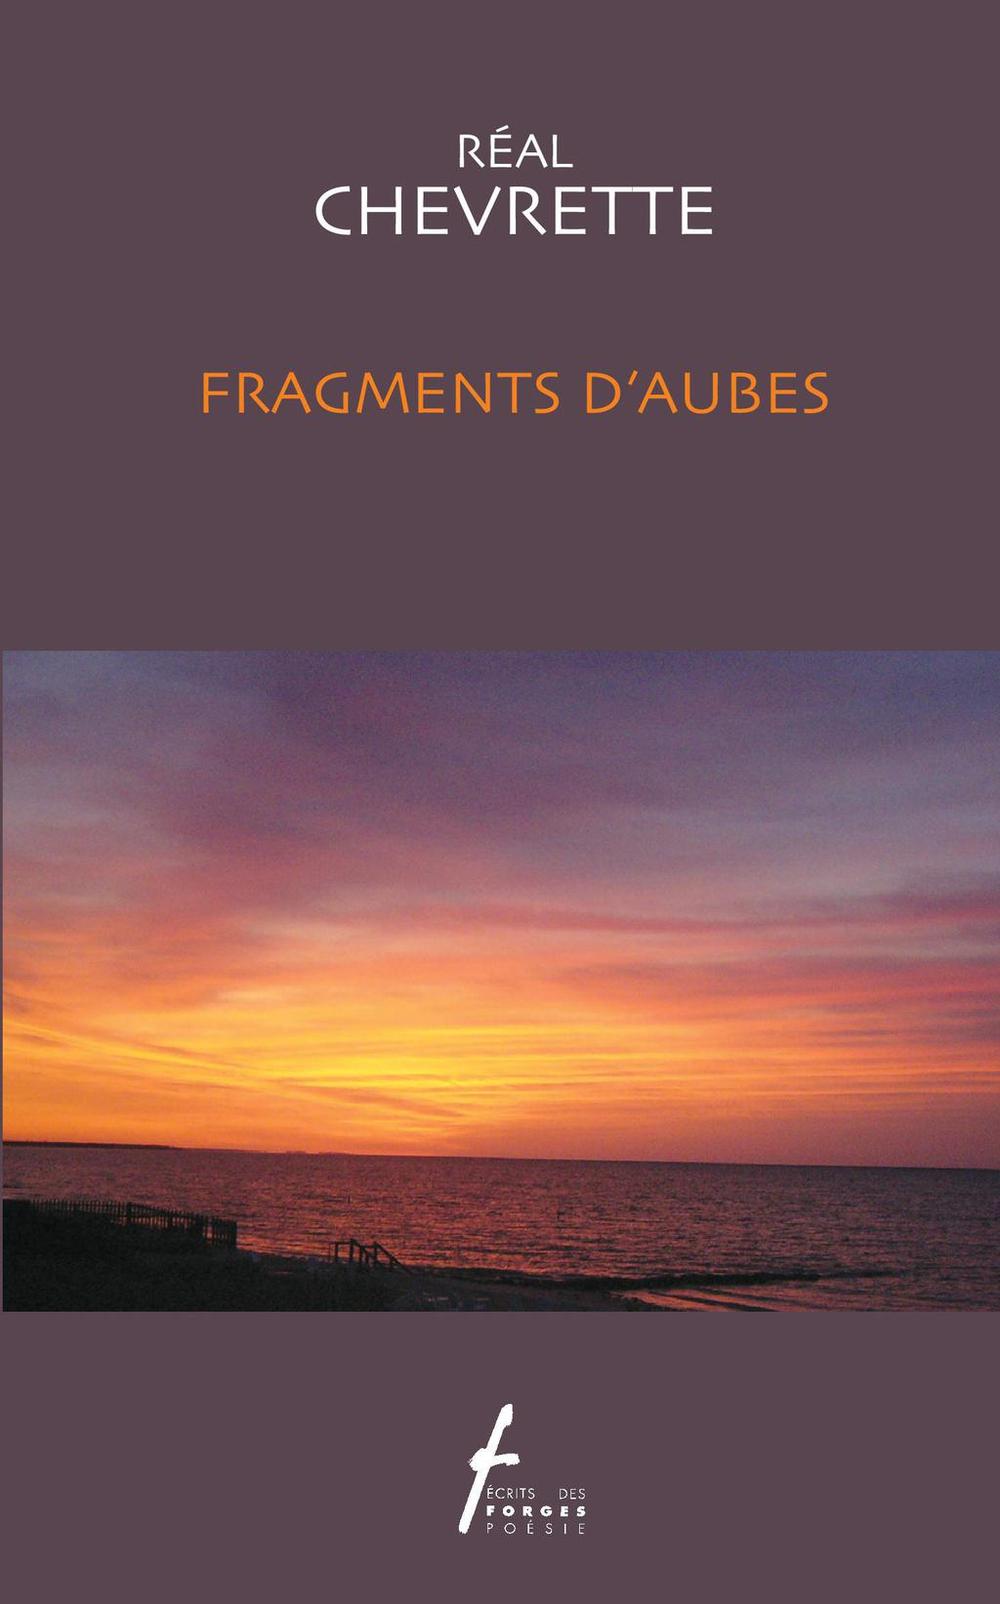 Fragments d'aubes